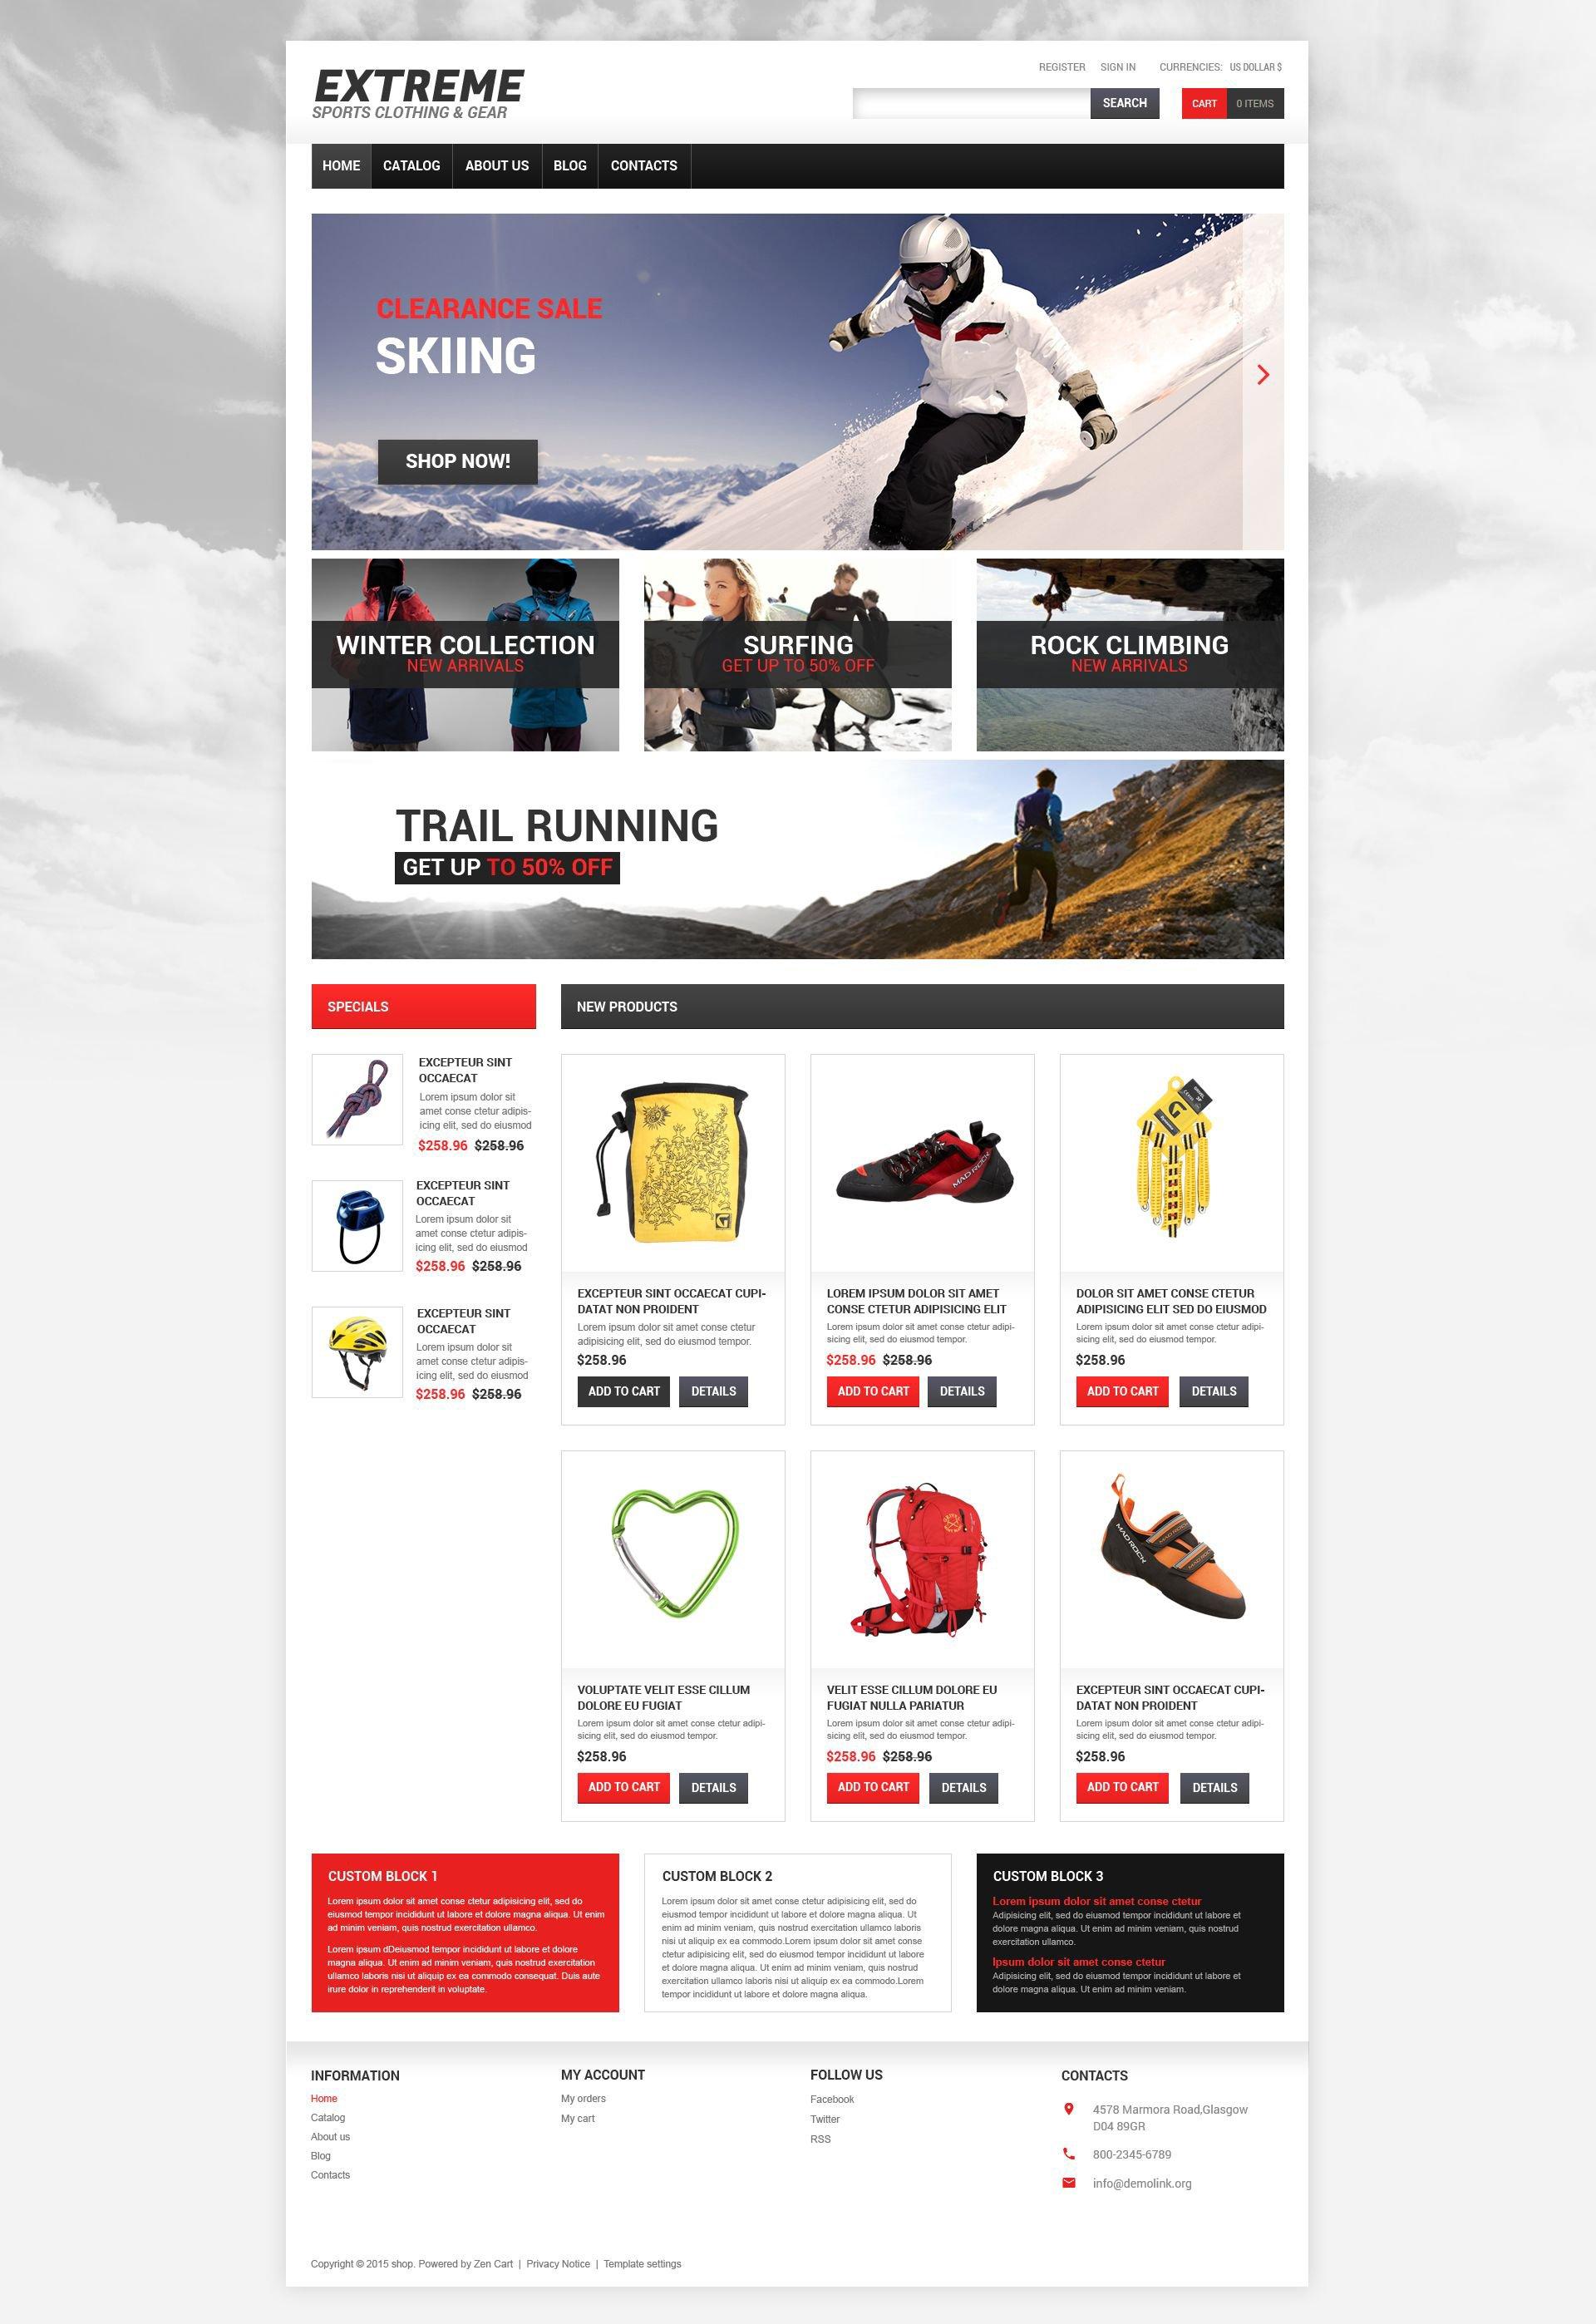 VirtueMart Template over Extreme sporten №55011